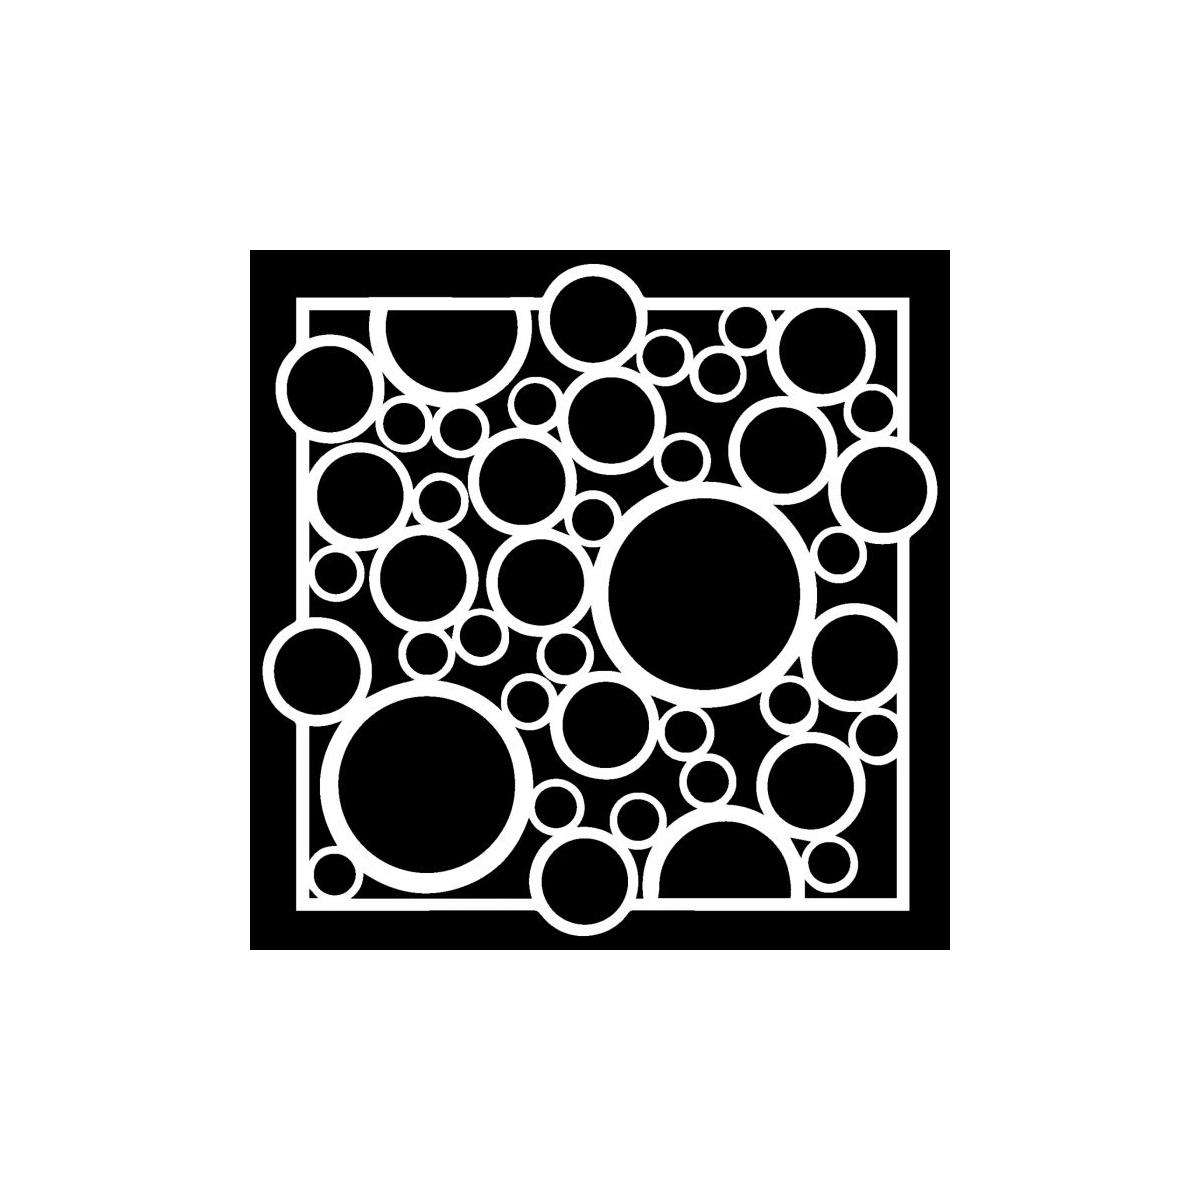 TCW, Stencil, 15x15, Bubble Rebound